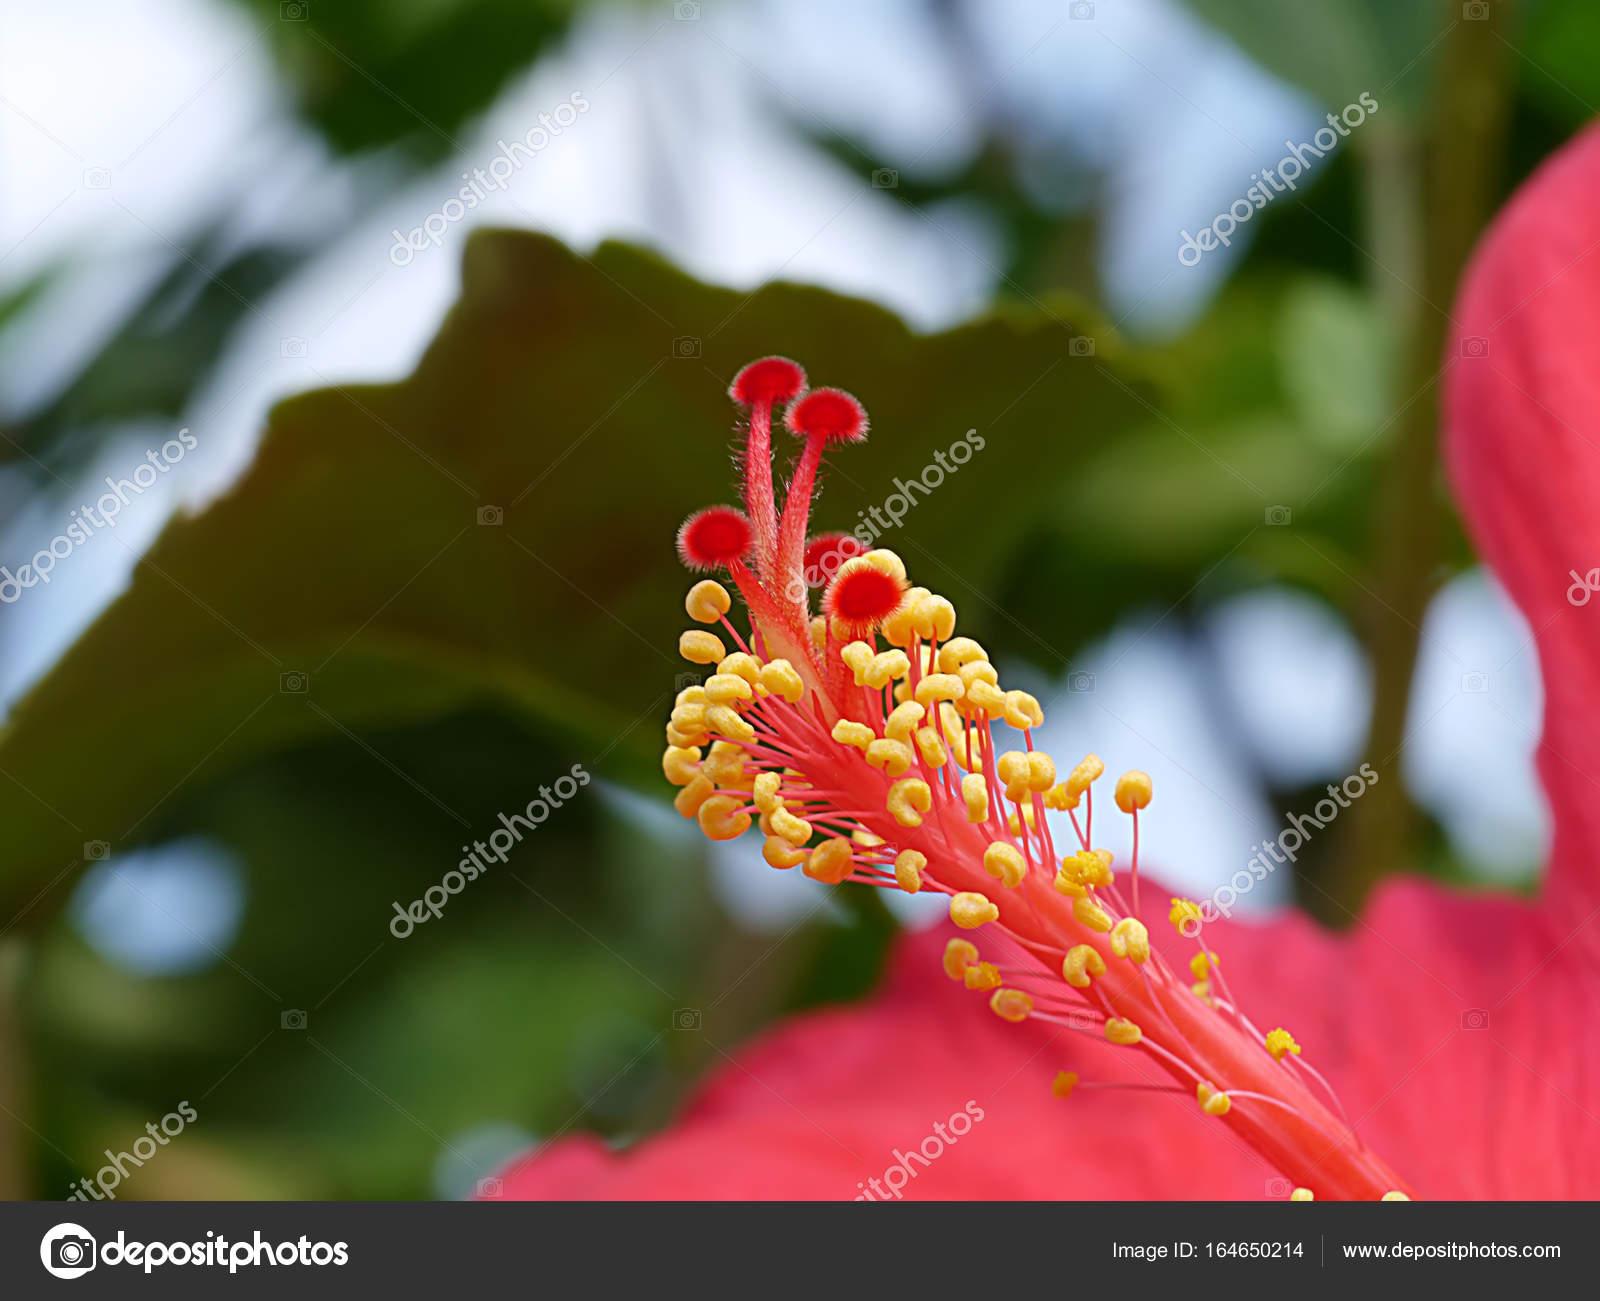 Red hibiscus flowers and yellow stamens stock photo red hibiscus flowers and yellow stamens stock photo mightylinksfo